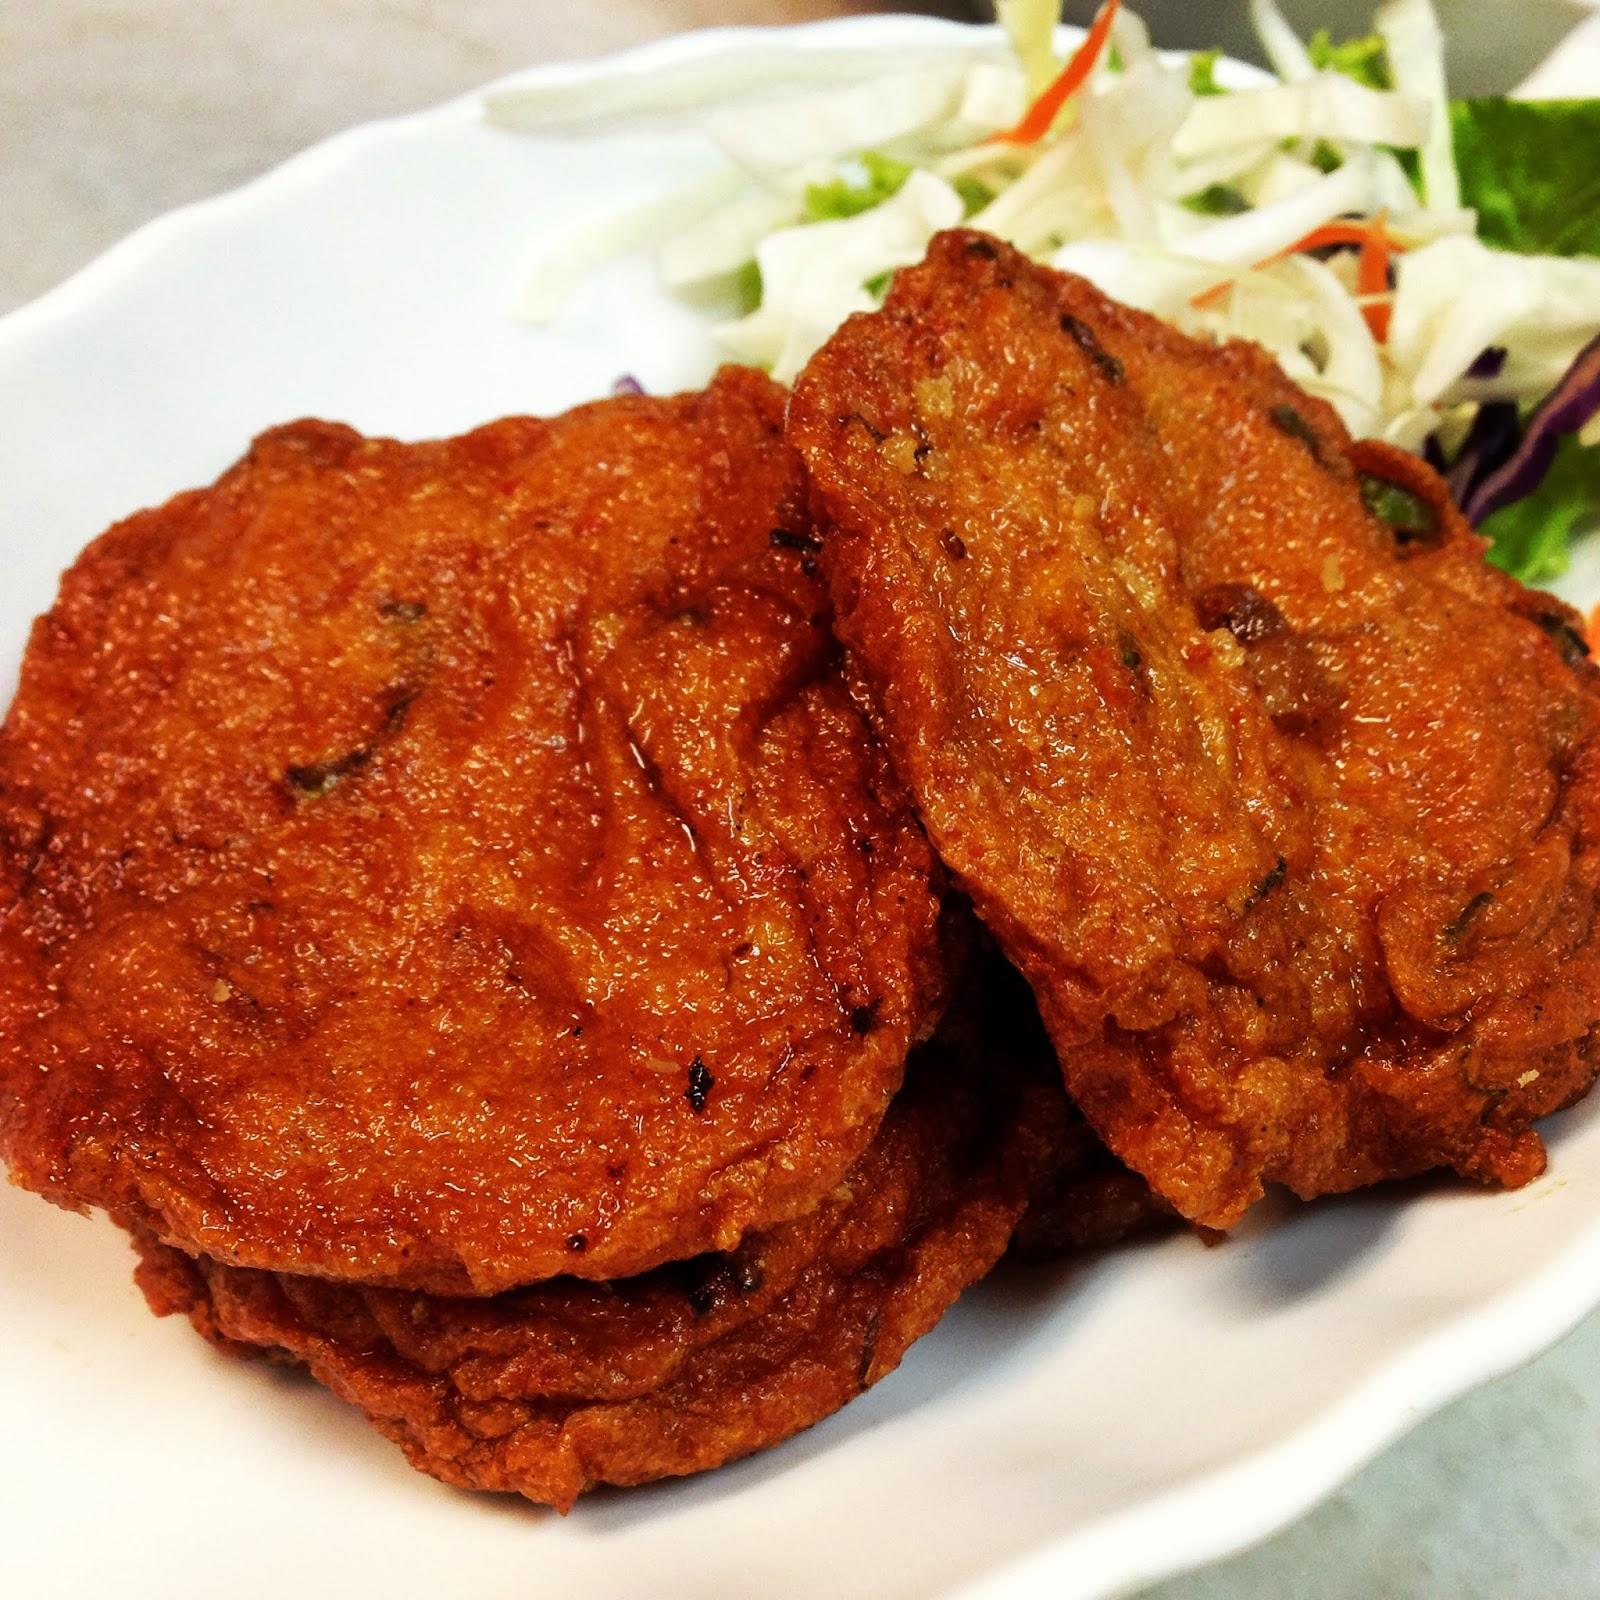 Tataro eats diandin leluk singapore for Deep fried fish